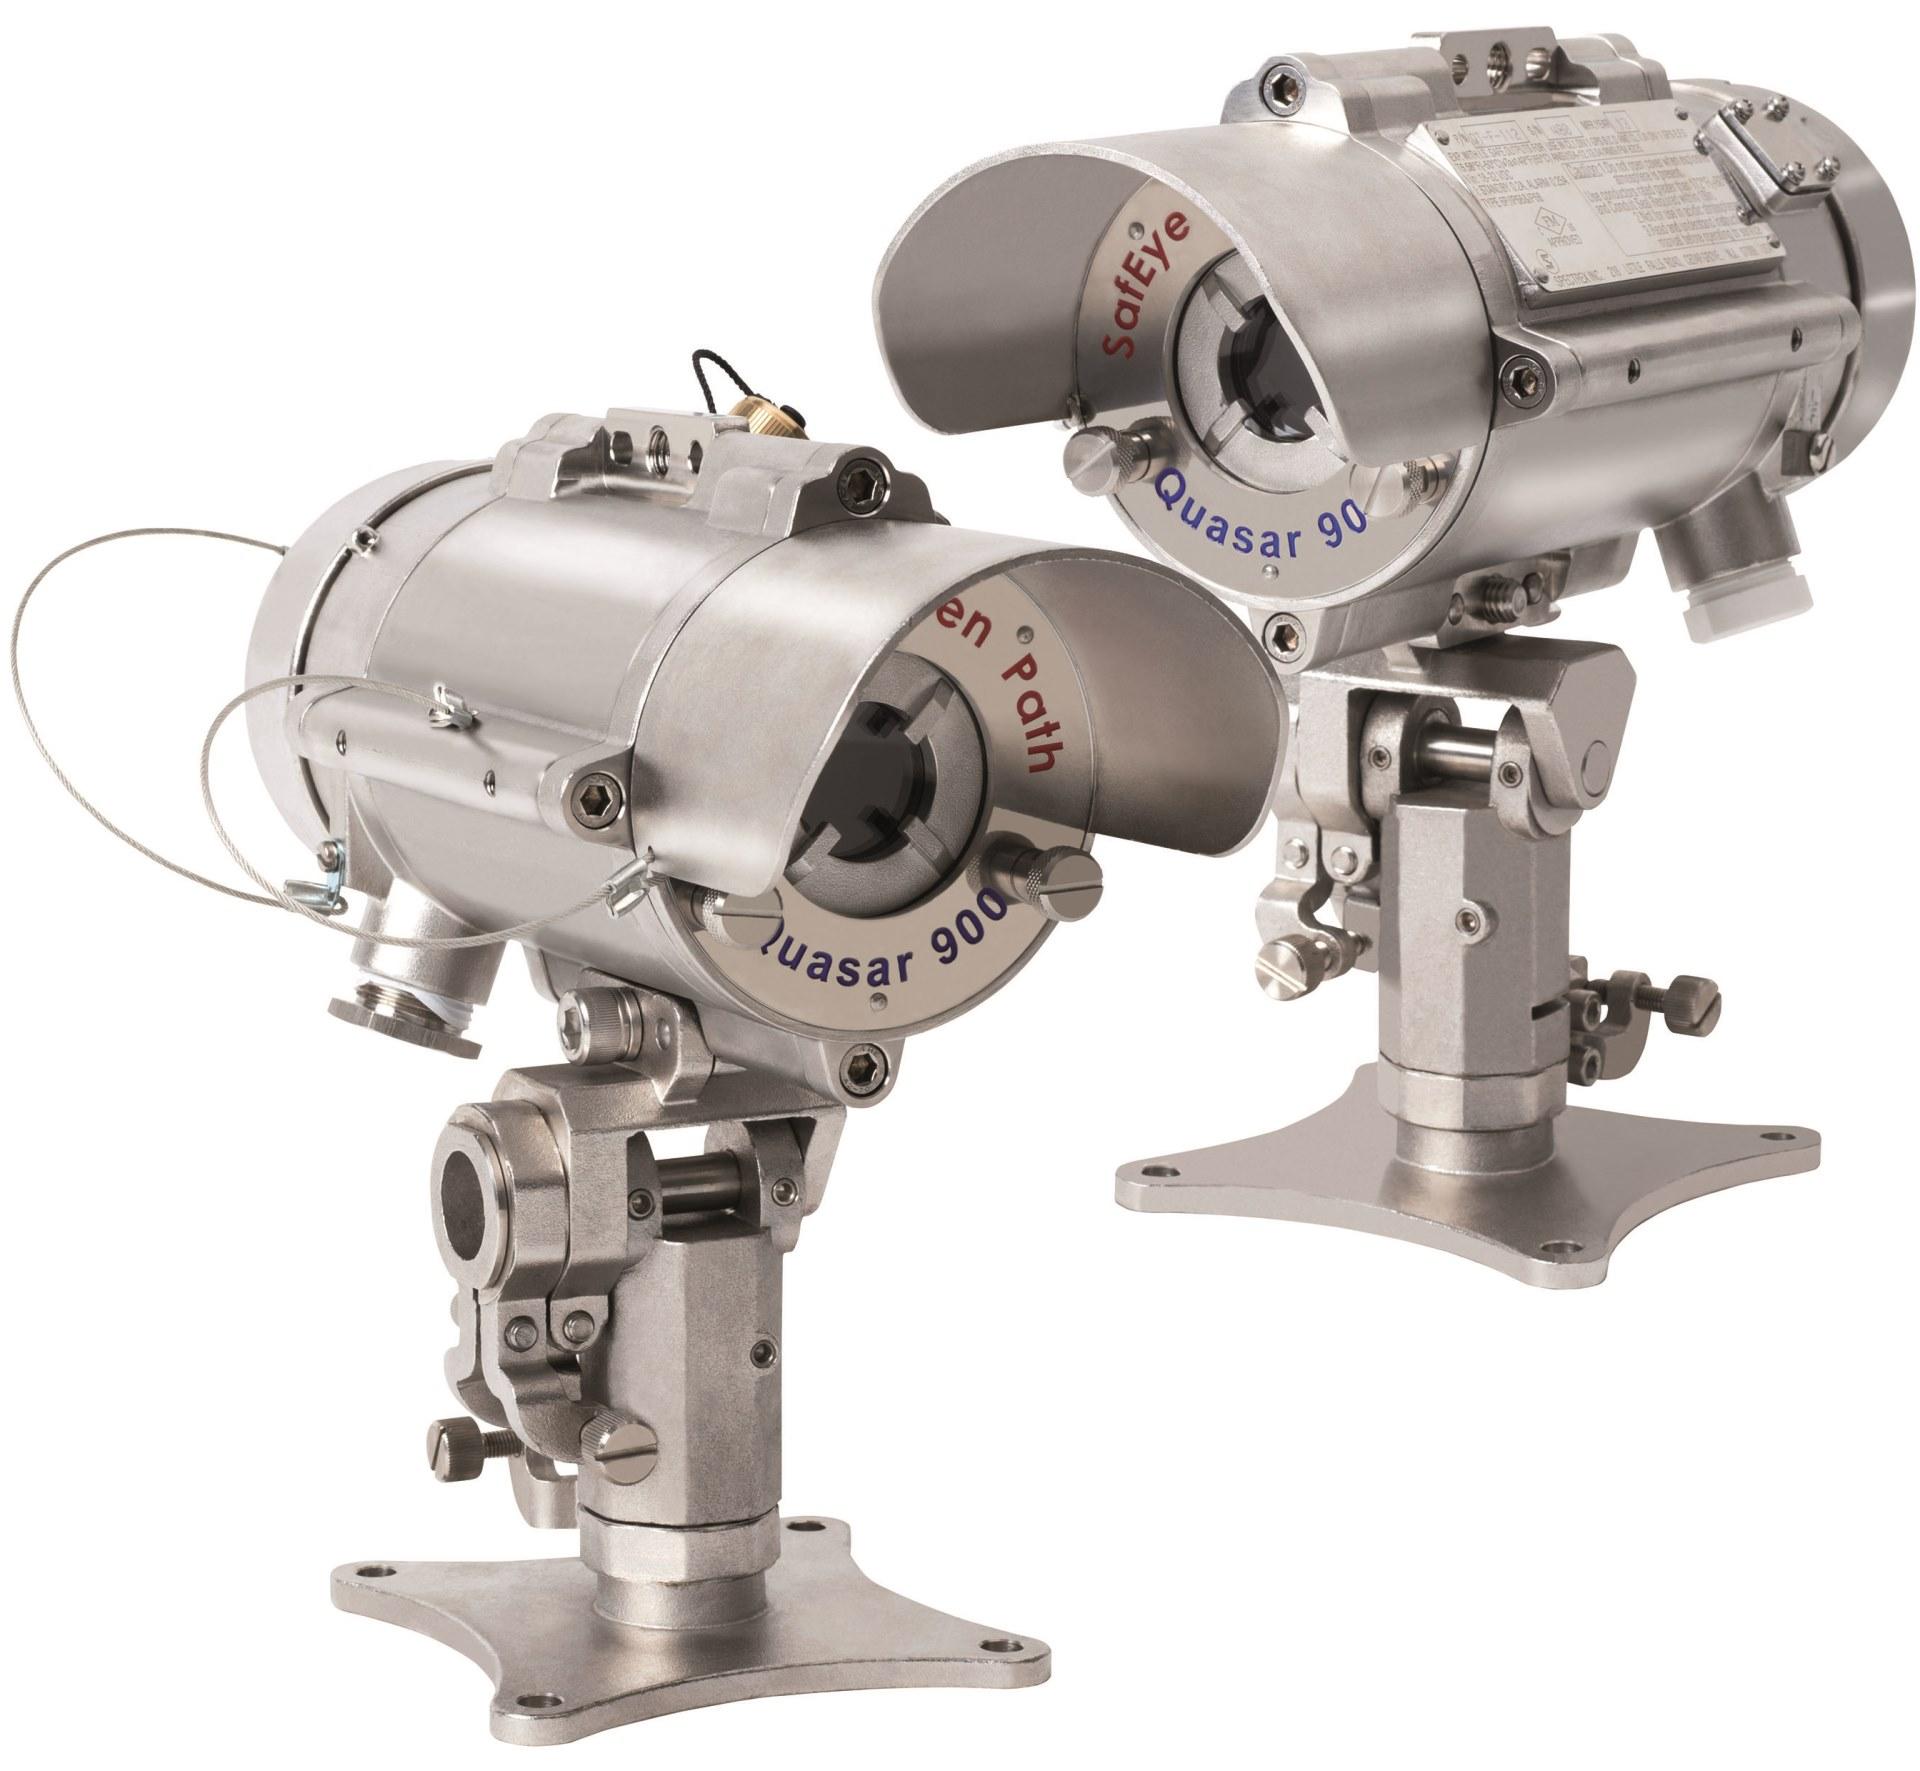 Gassdetektor gassmåler gassalarm ved gasslekkasje Gas leak detector sensor IR Infra red Linje Spectrex ATEX IECEx EExd-flameproof EExe approved SafEye Quasar 900